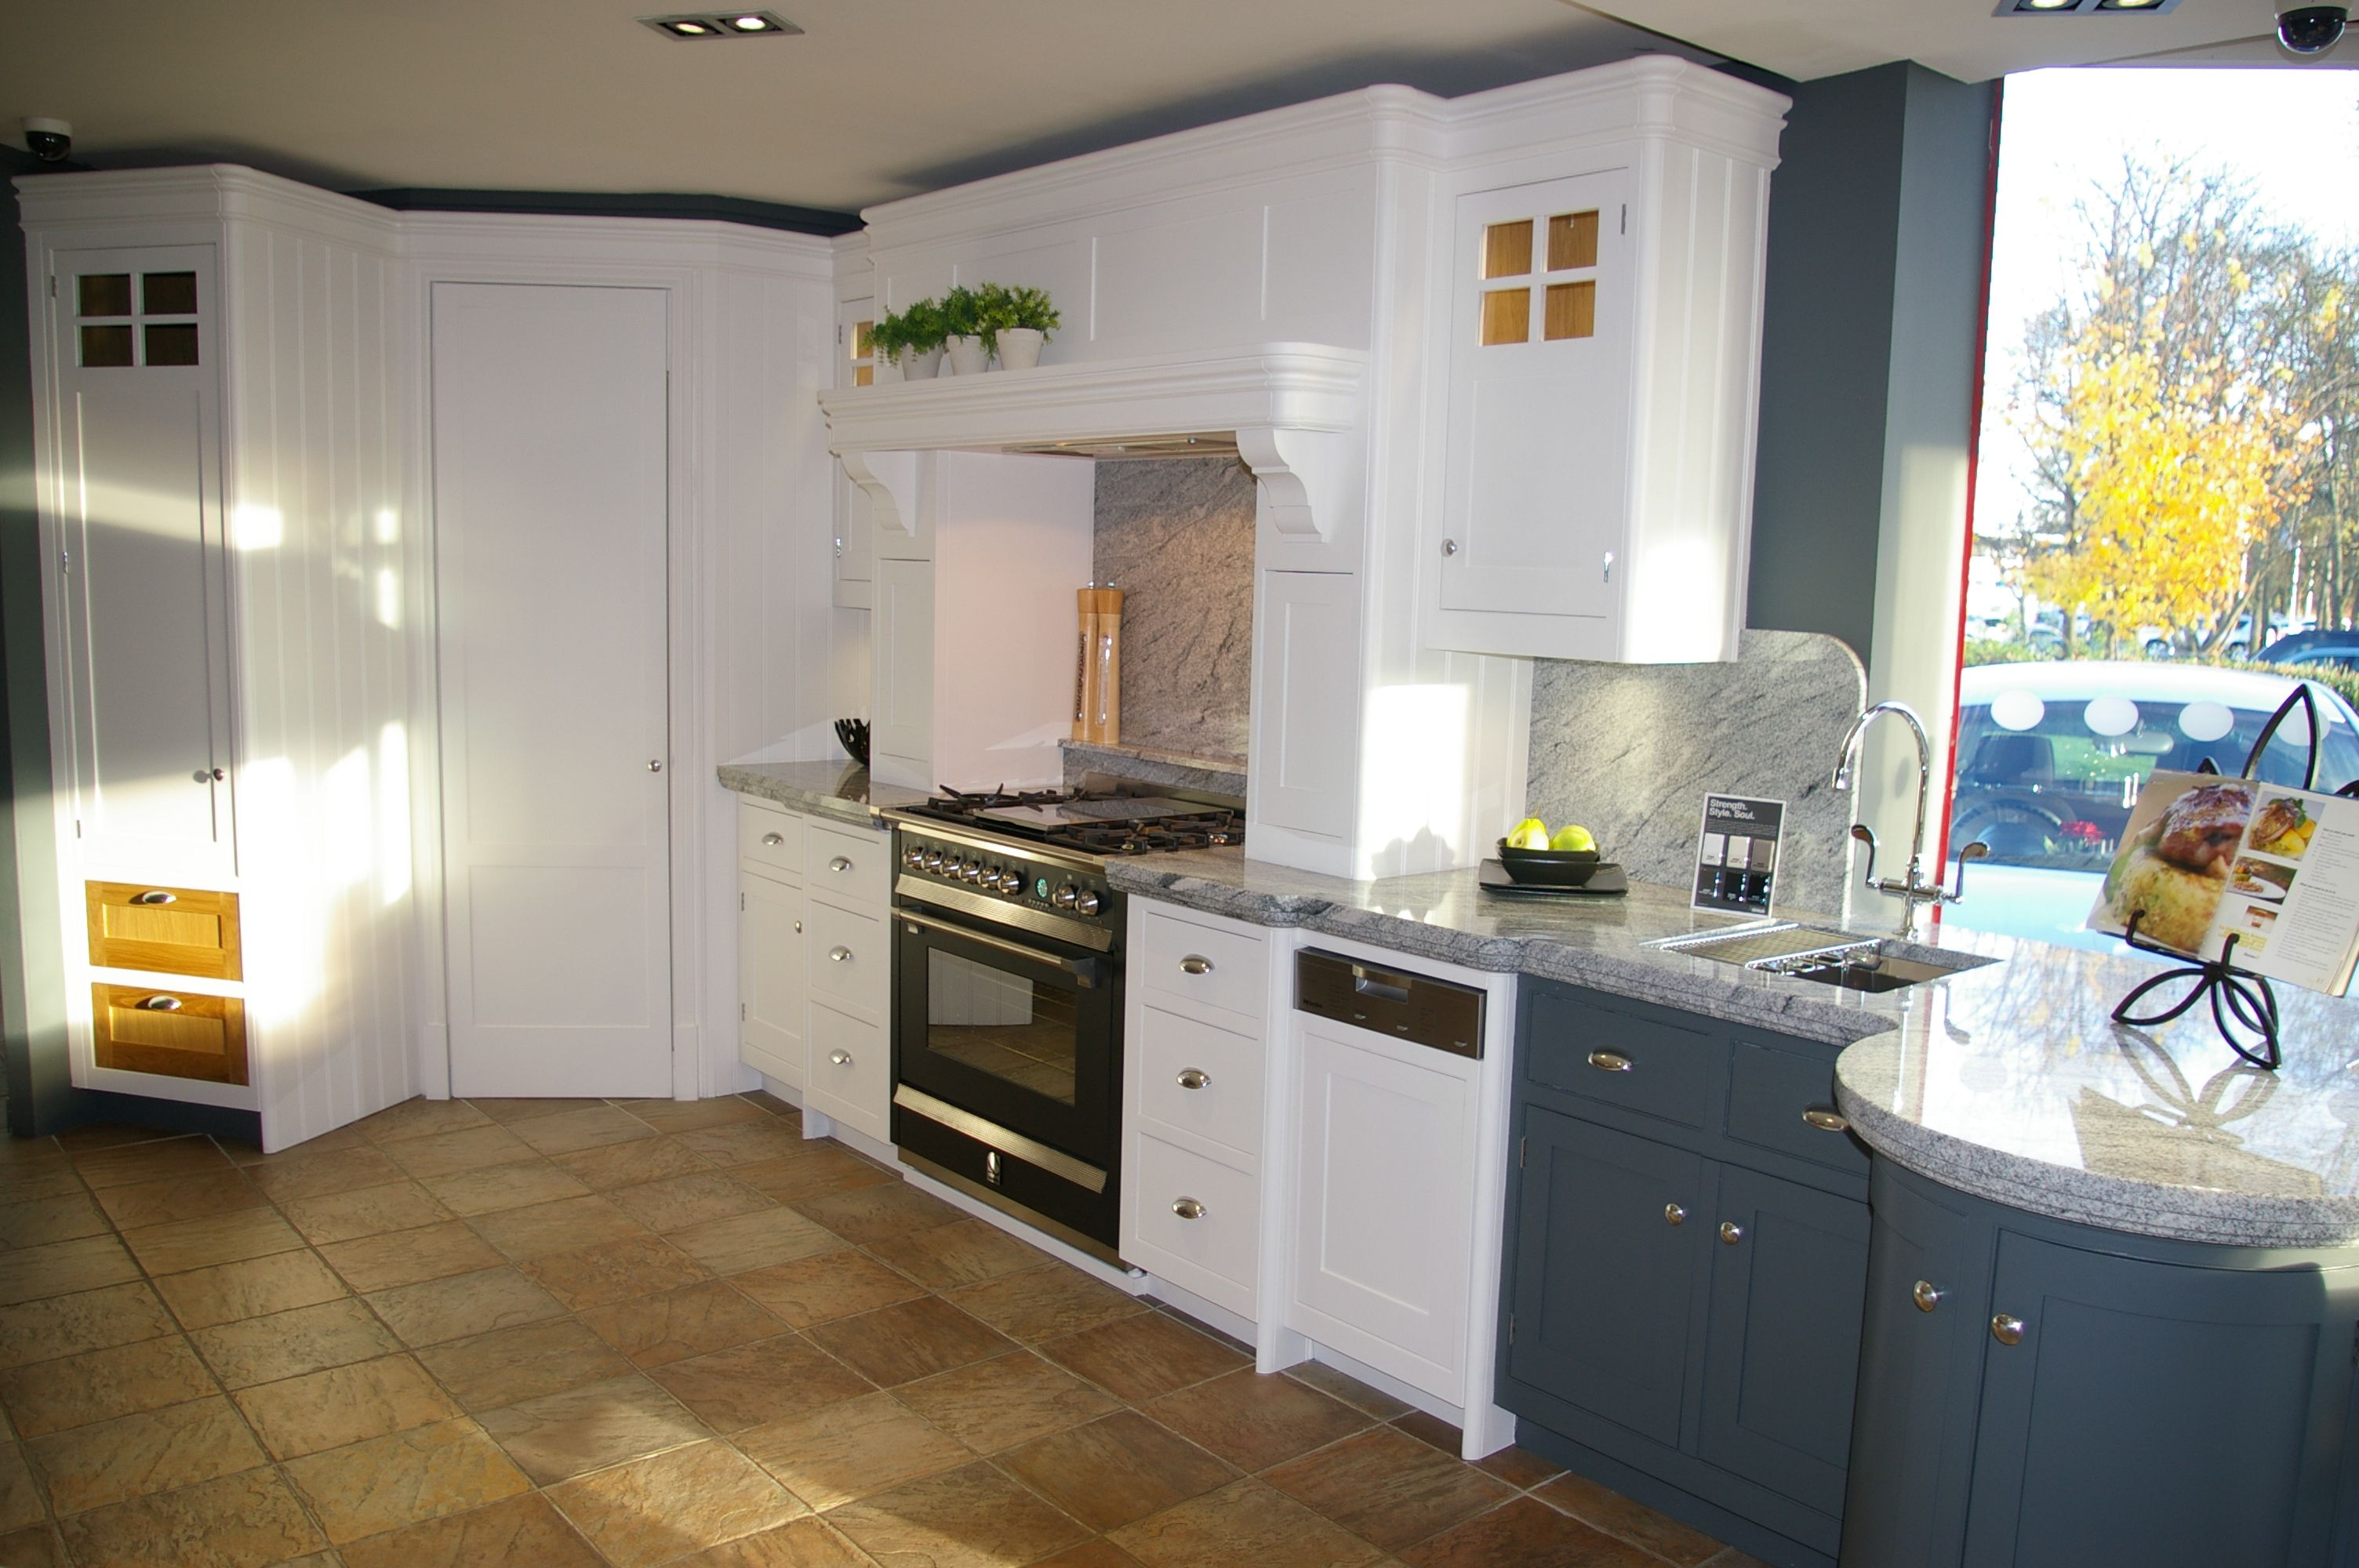 Uncategorized. Kitchen Furniture Perth. jamesmcavoybr Home Design